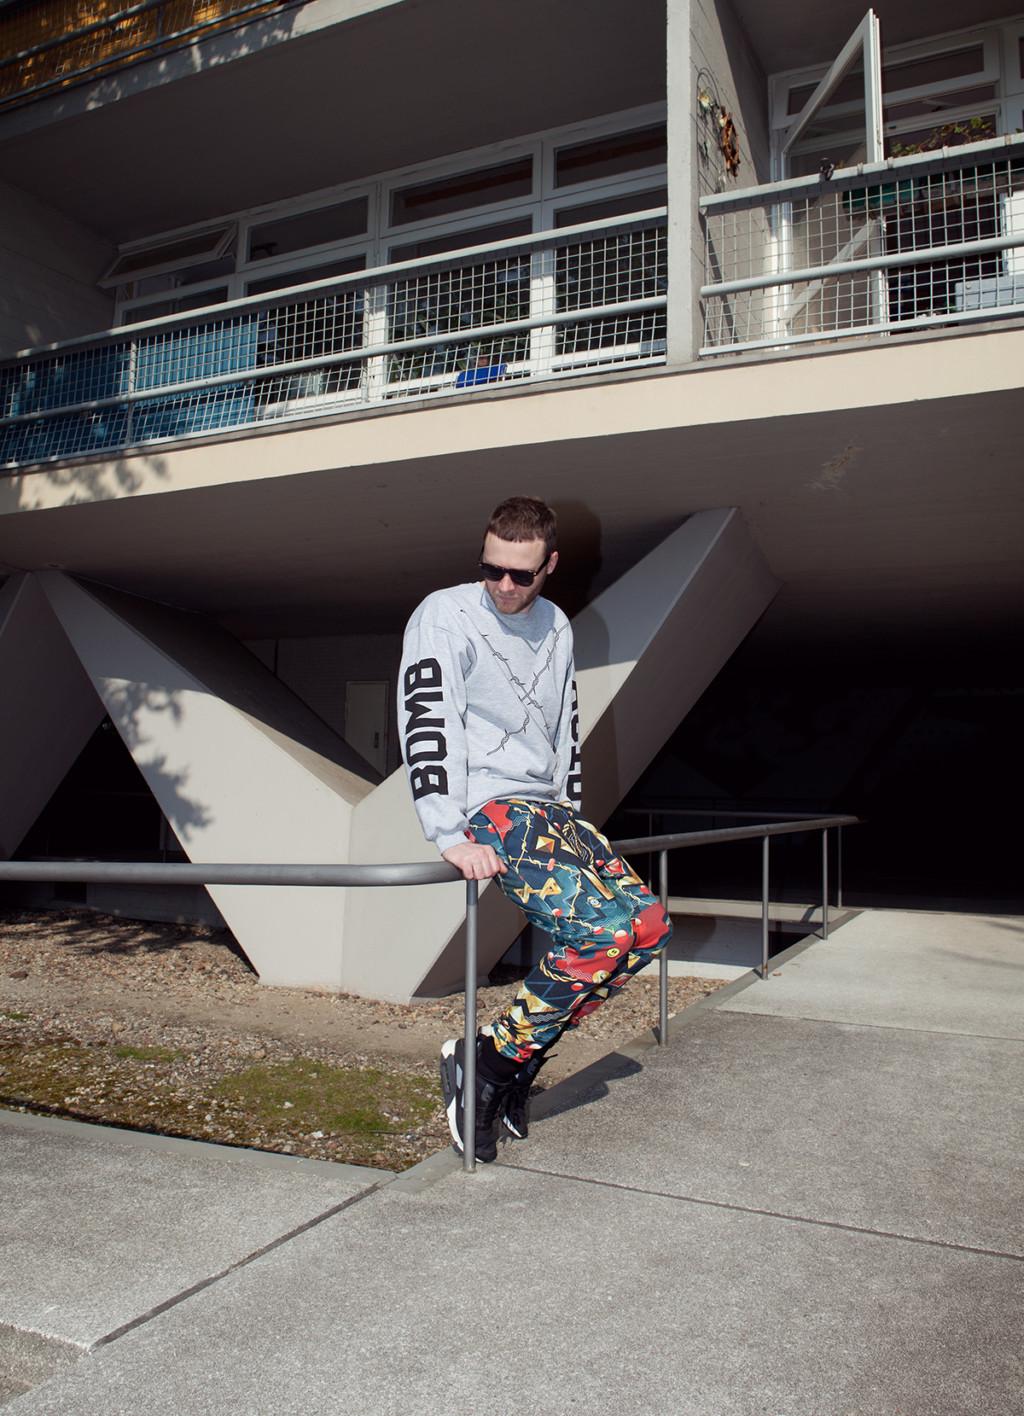 Florian Fischer - Multidisciplianary Designer based in Berlin apollokrieg